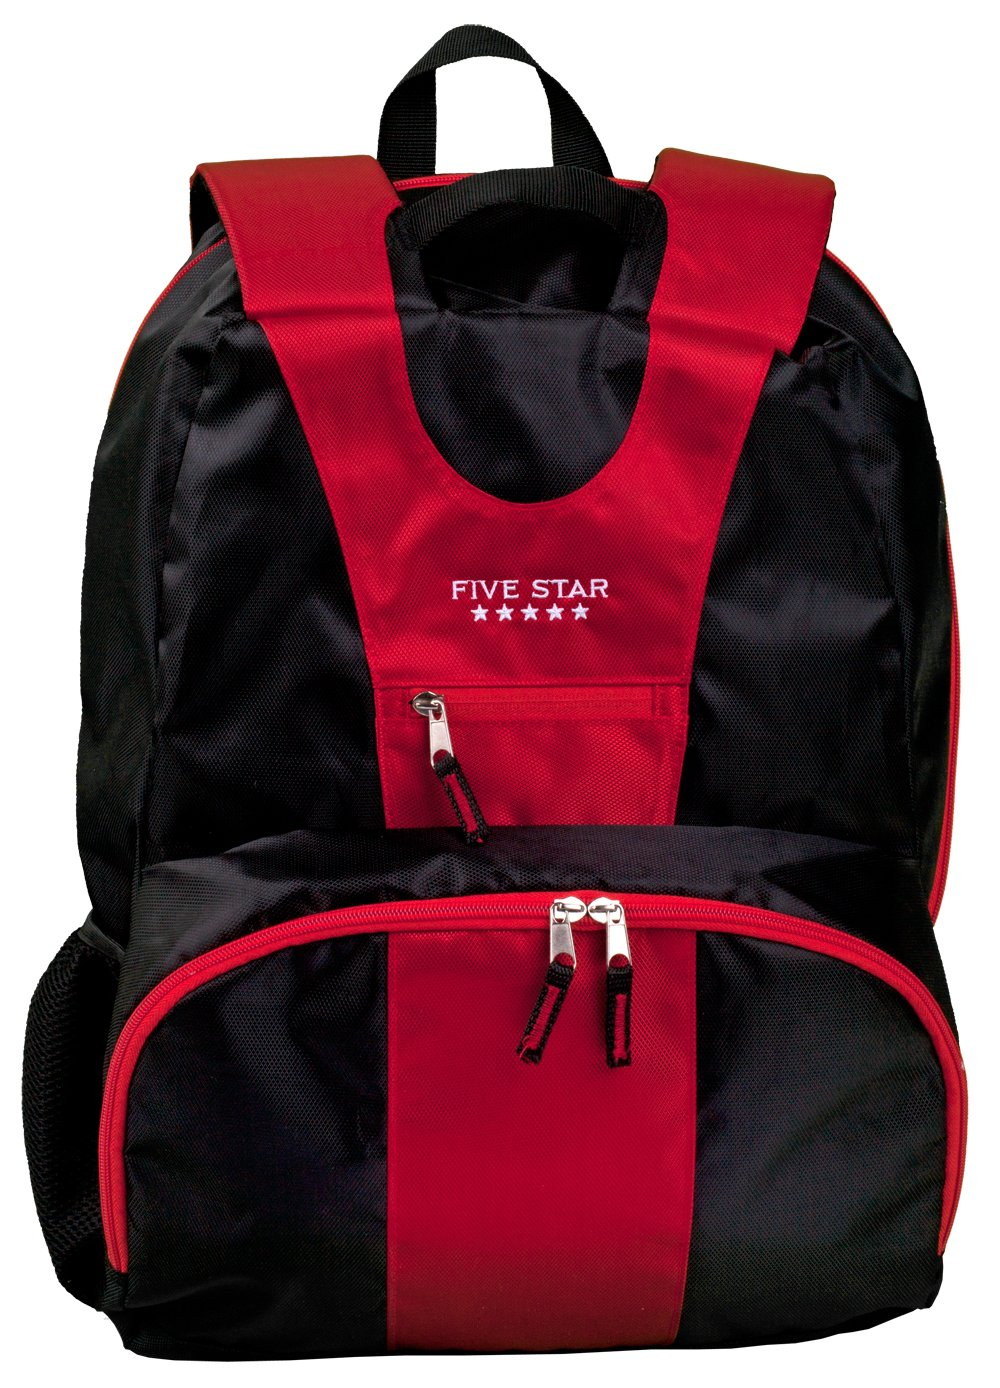 Amazon.com: Five Star School Backpack, Ergo Sidekick, Holds 16 ...